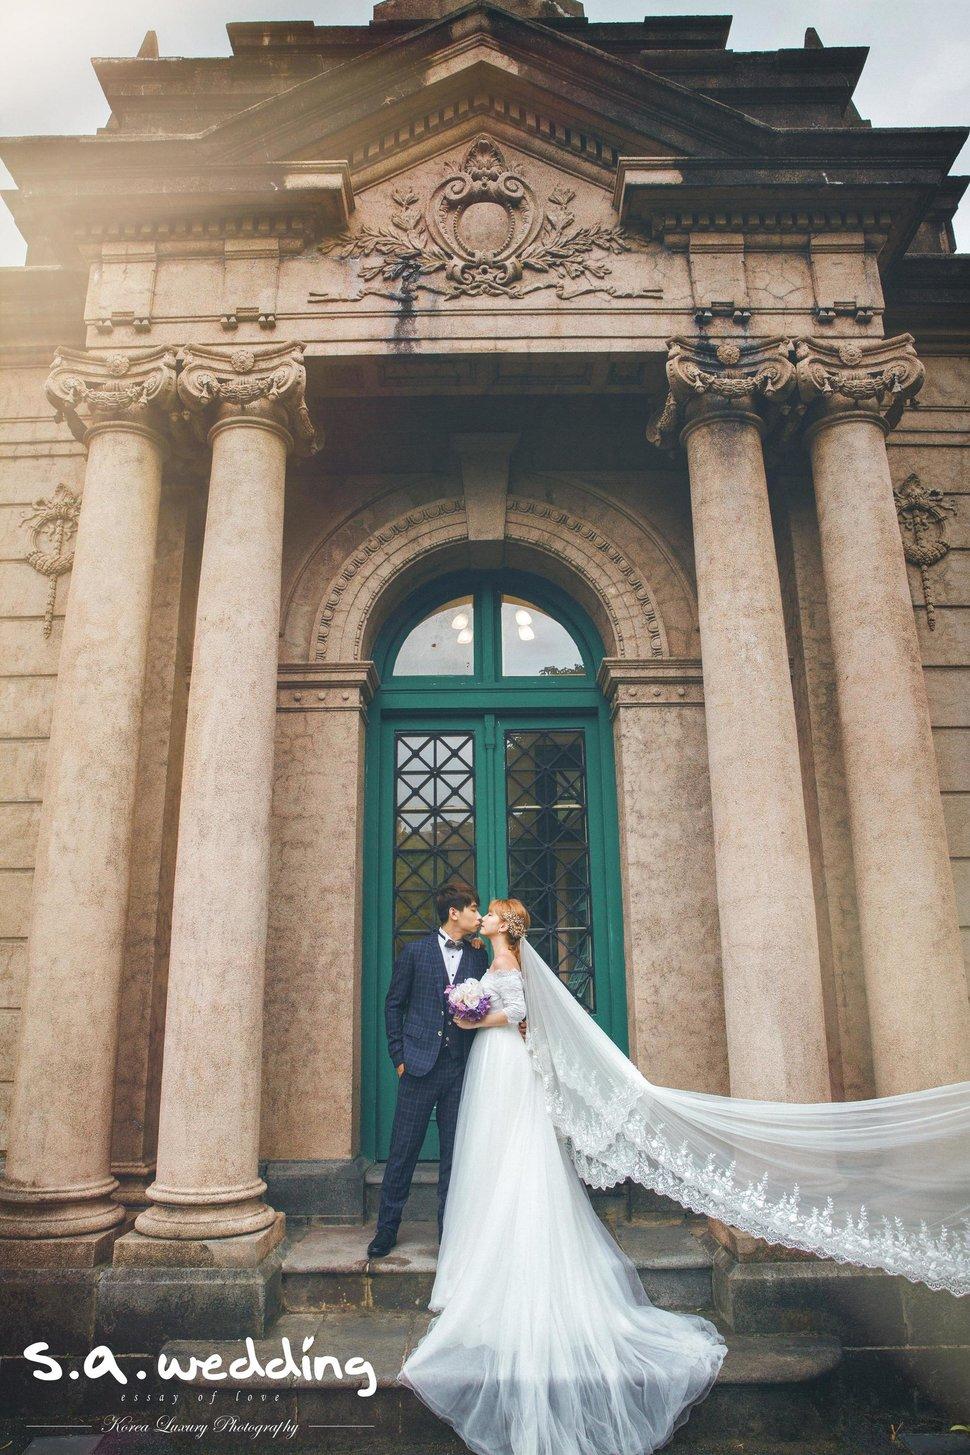 NSH_2298_ps (Copy) - s.a. wedding 韓國婚紗攝影《結婚吧》